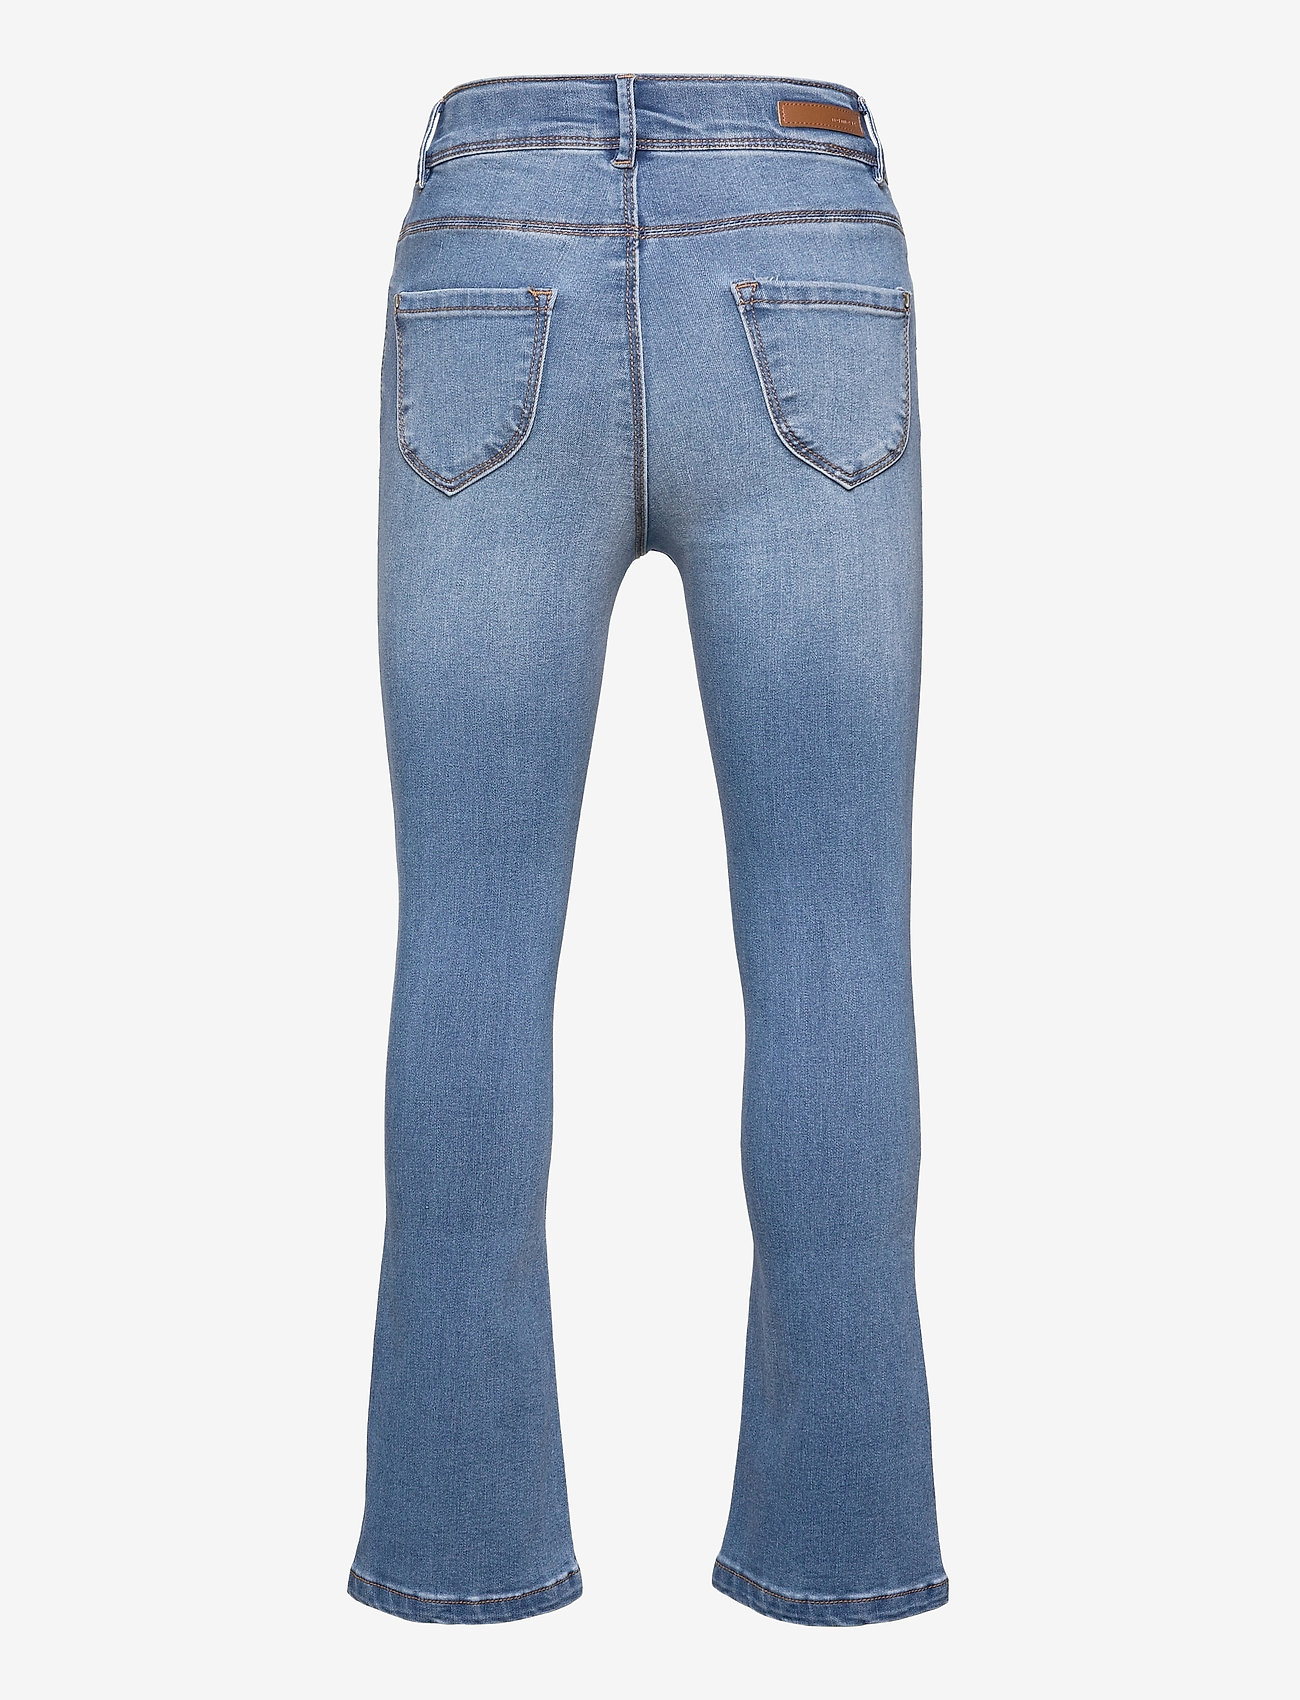 name it - NKFPOLLY DNMTRILLAS 2460 HW BO PANT NOOS - jeans - medium blue denim - 1